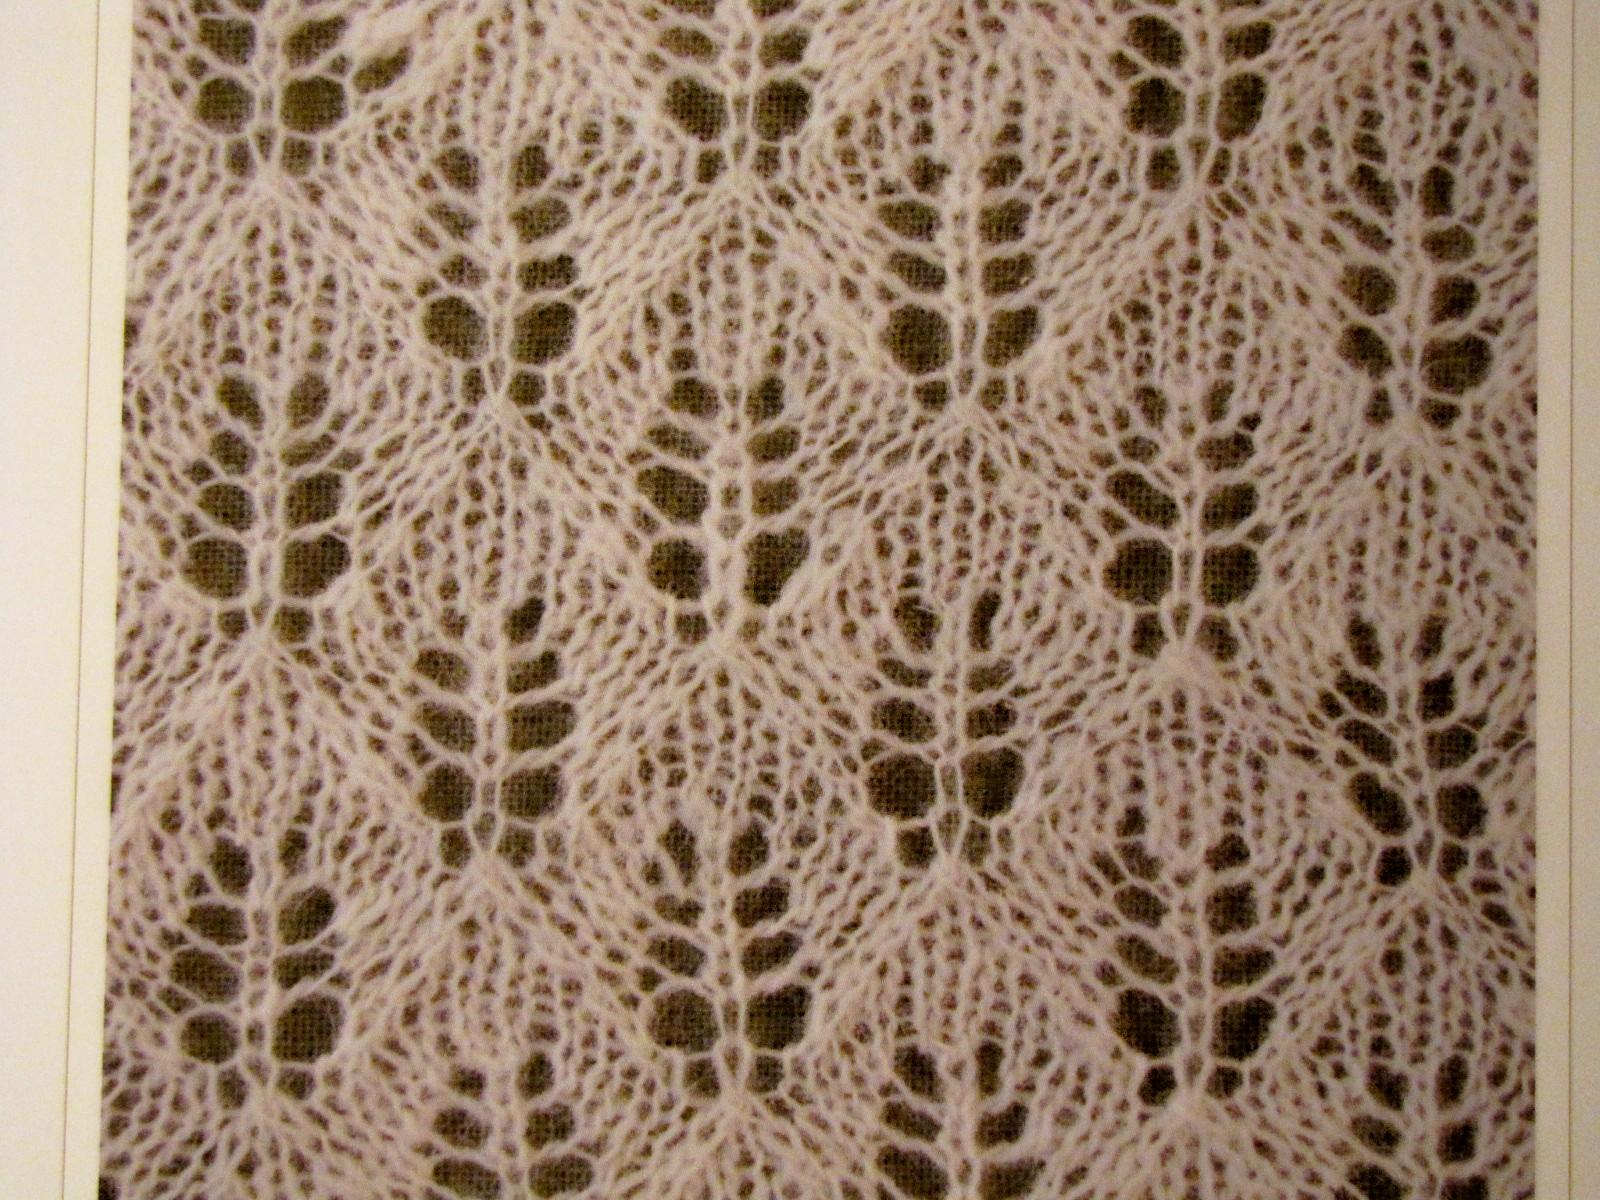 Enchanting Estonian Lace Knitting Patterns Free Adornment - Blanket ...